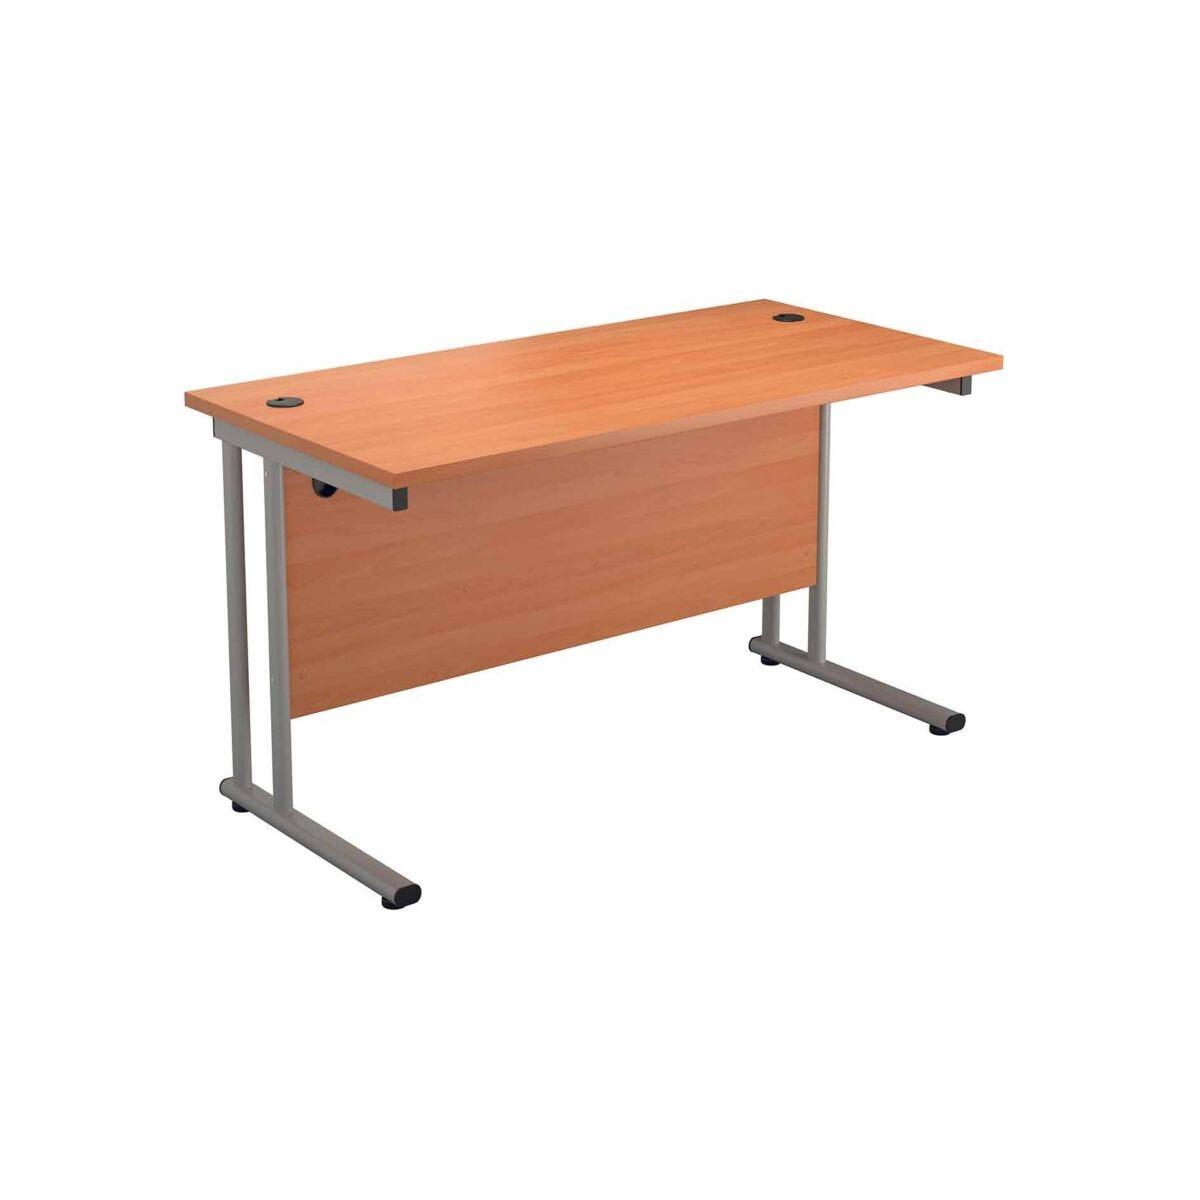 TC Office Start Silver Cantilever Frame Desk 1400x800mm